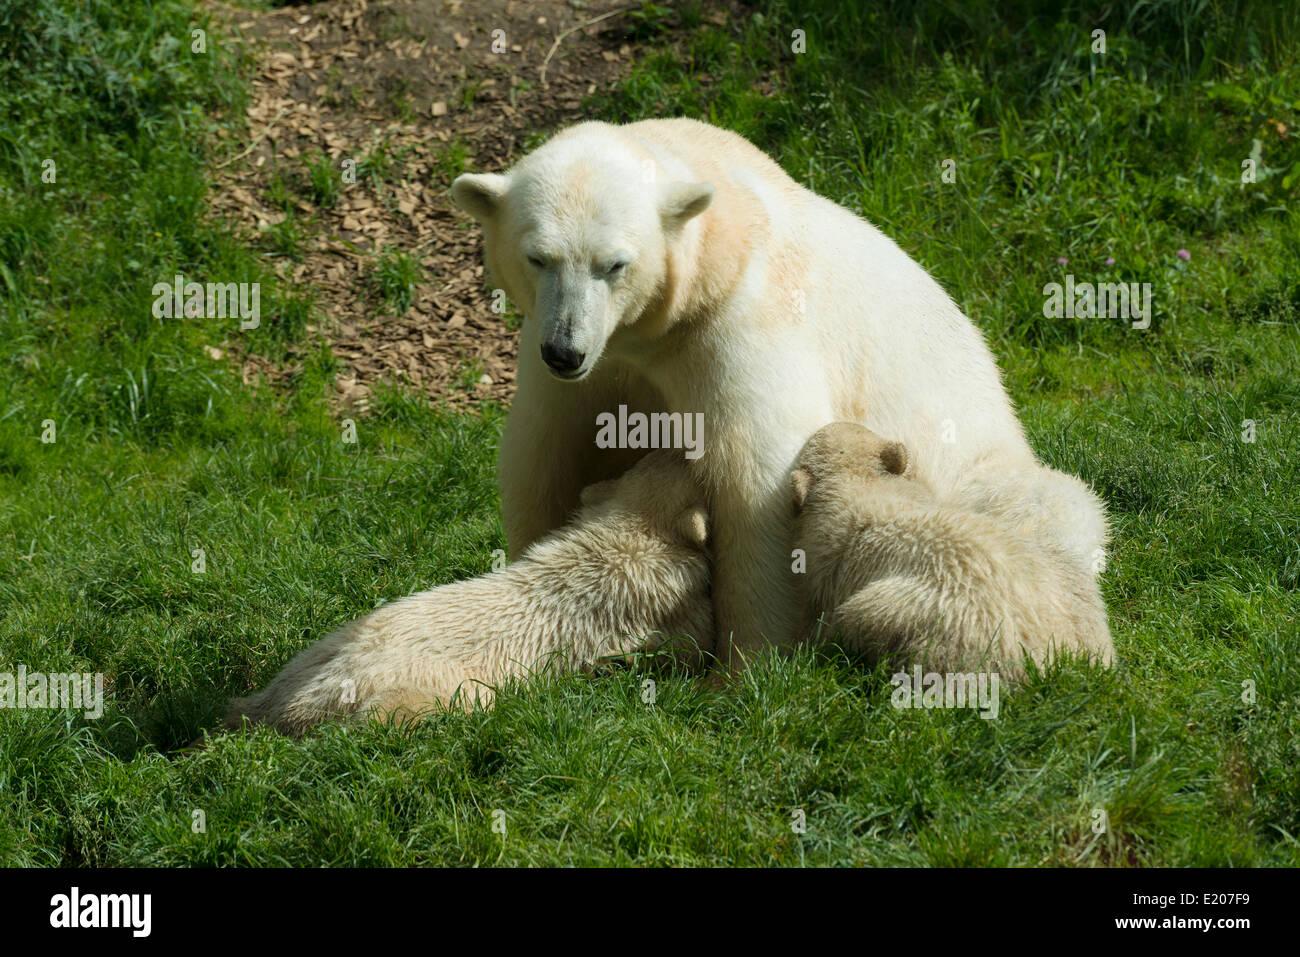 Polar Bears (Ursus maritimus) female Giovanna suckling her cubsNela and Nobby, 6 months, Hellabrunn, Munich, Upper - Stock Image